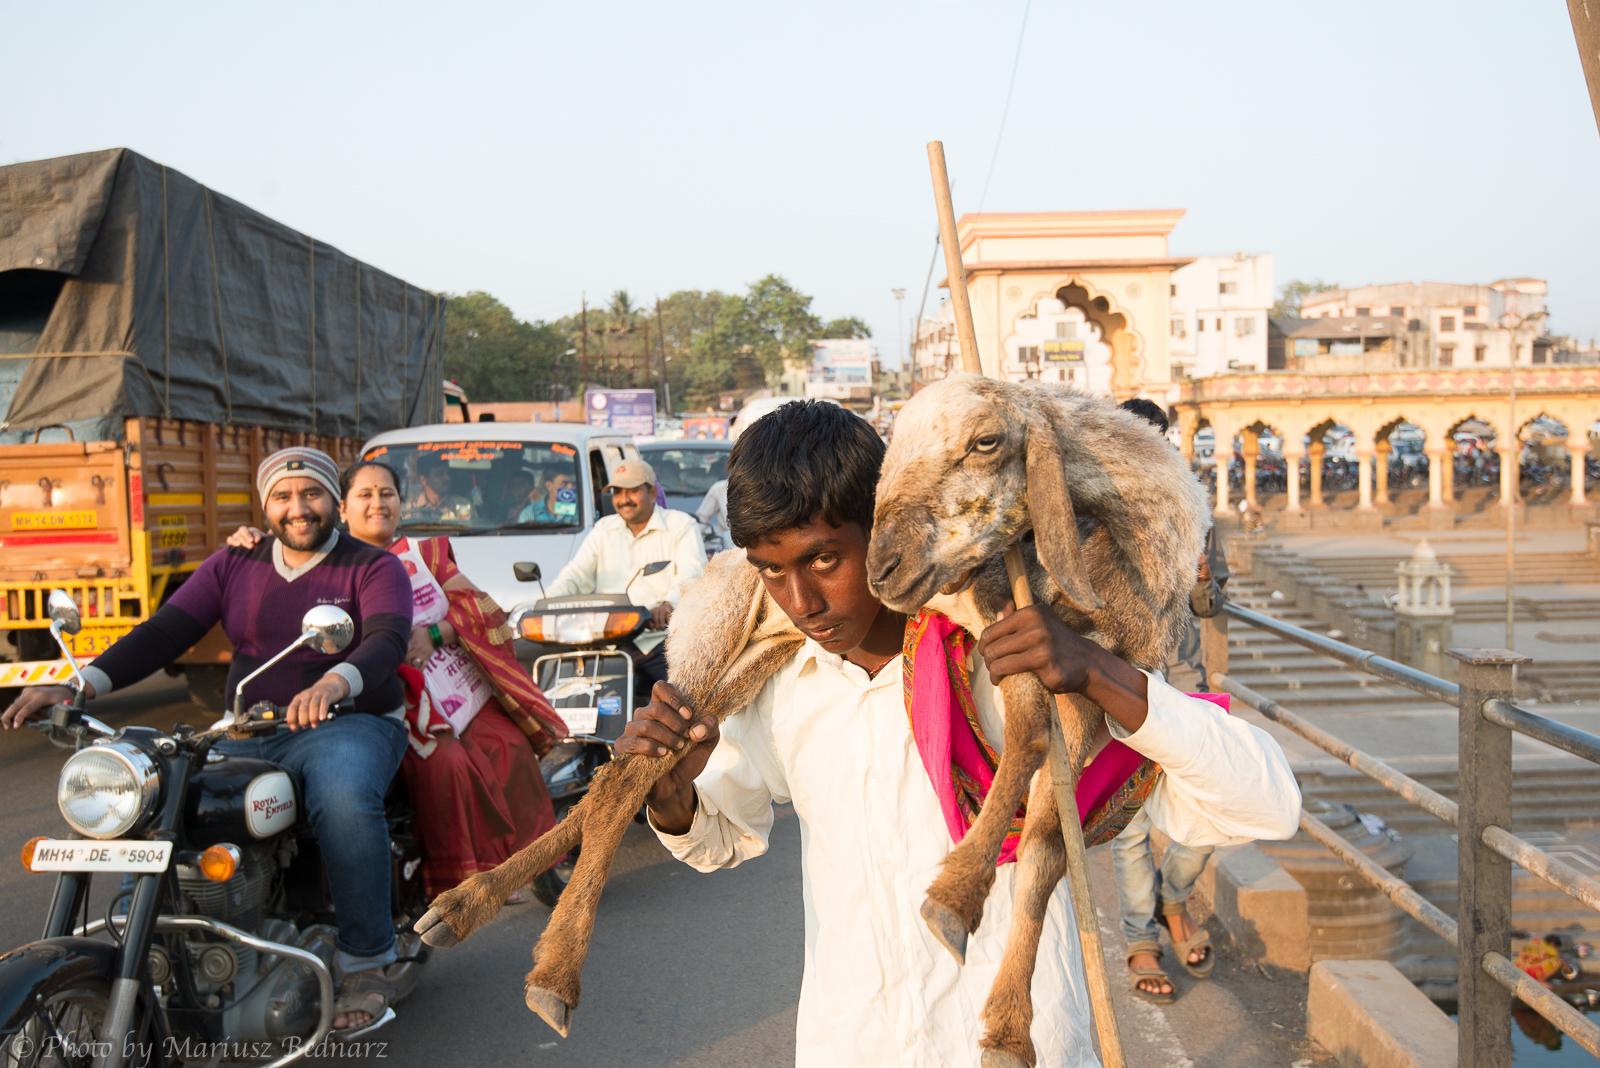 Man with sheep ORYGINAL